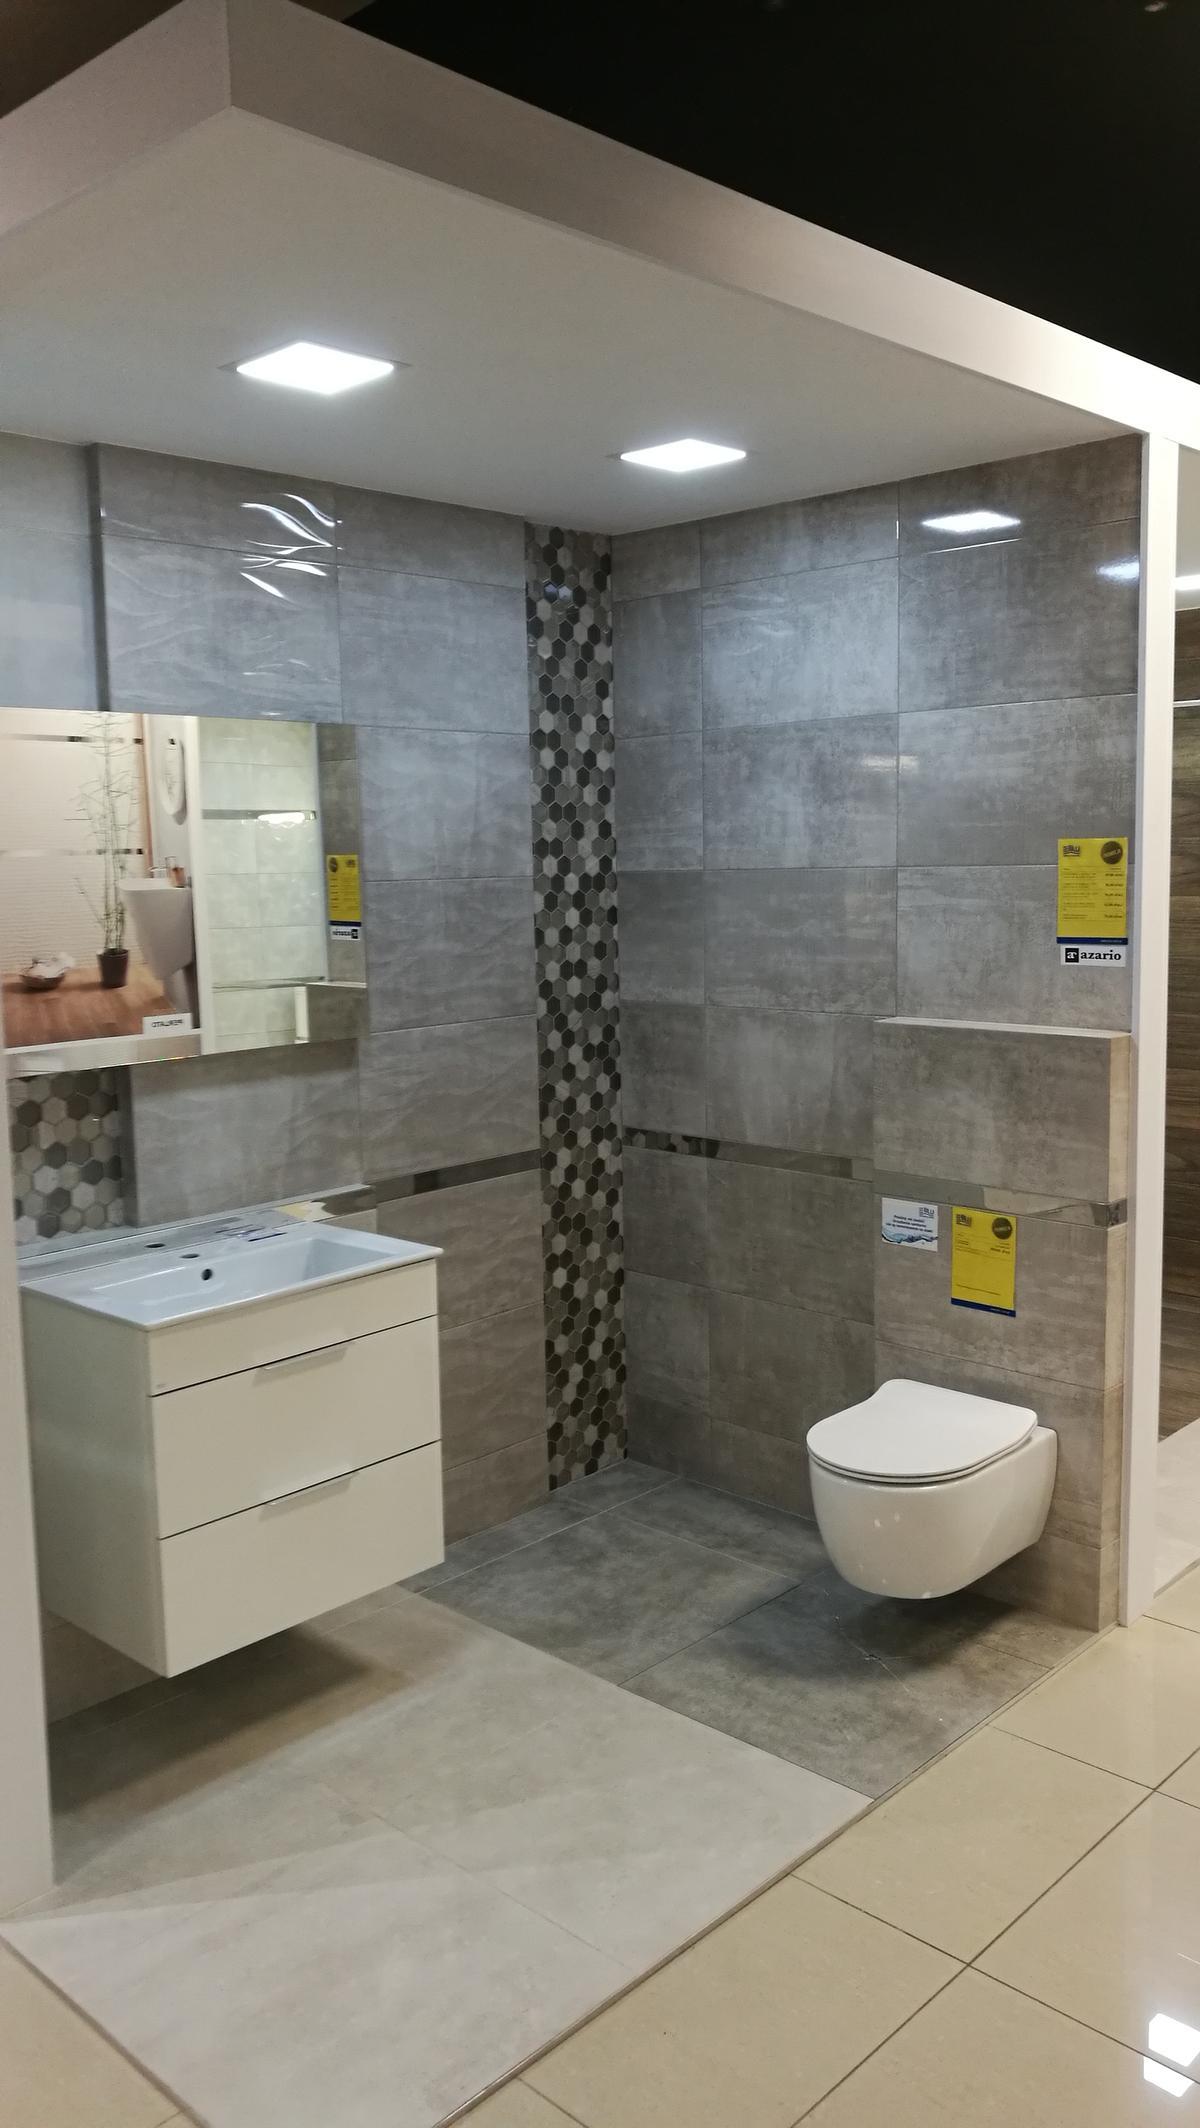 Ekspozycja Azario Costa - BLU salon łazienek Siedlce - zdjęcie od BLU salon łazienek Siedlce